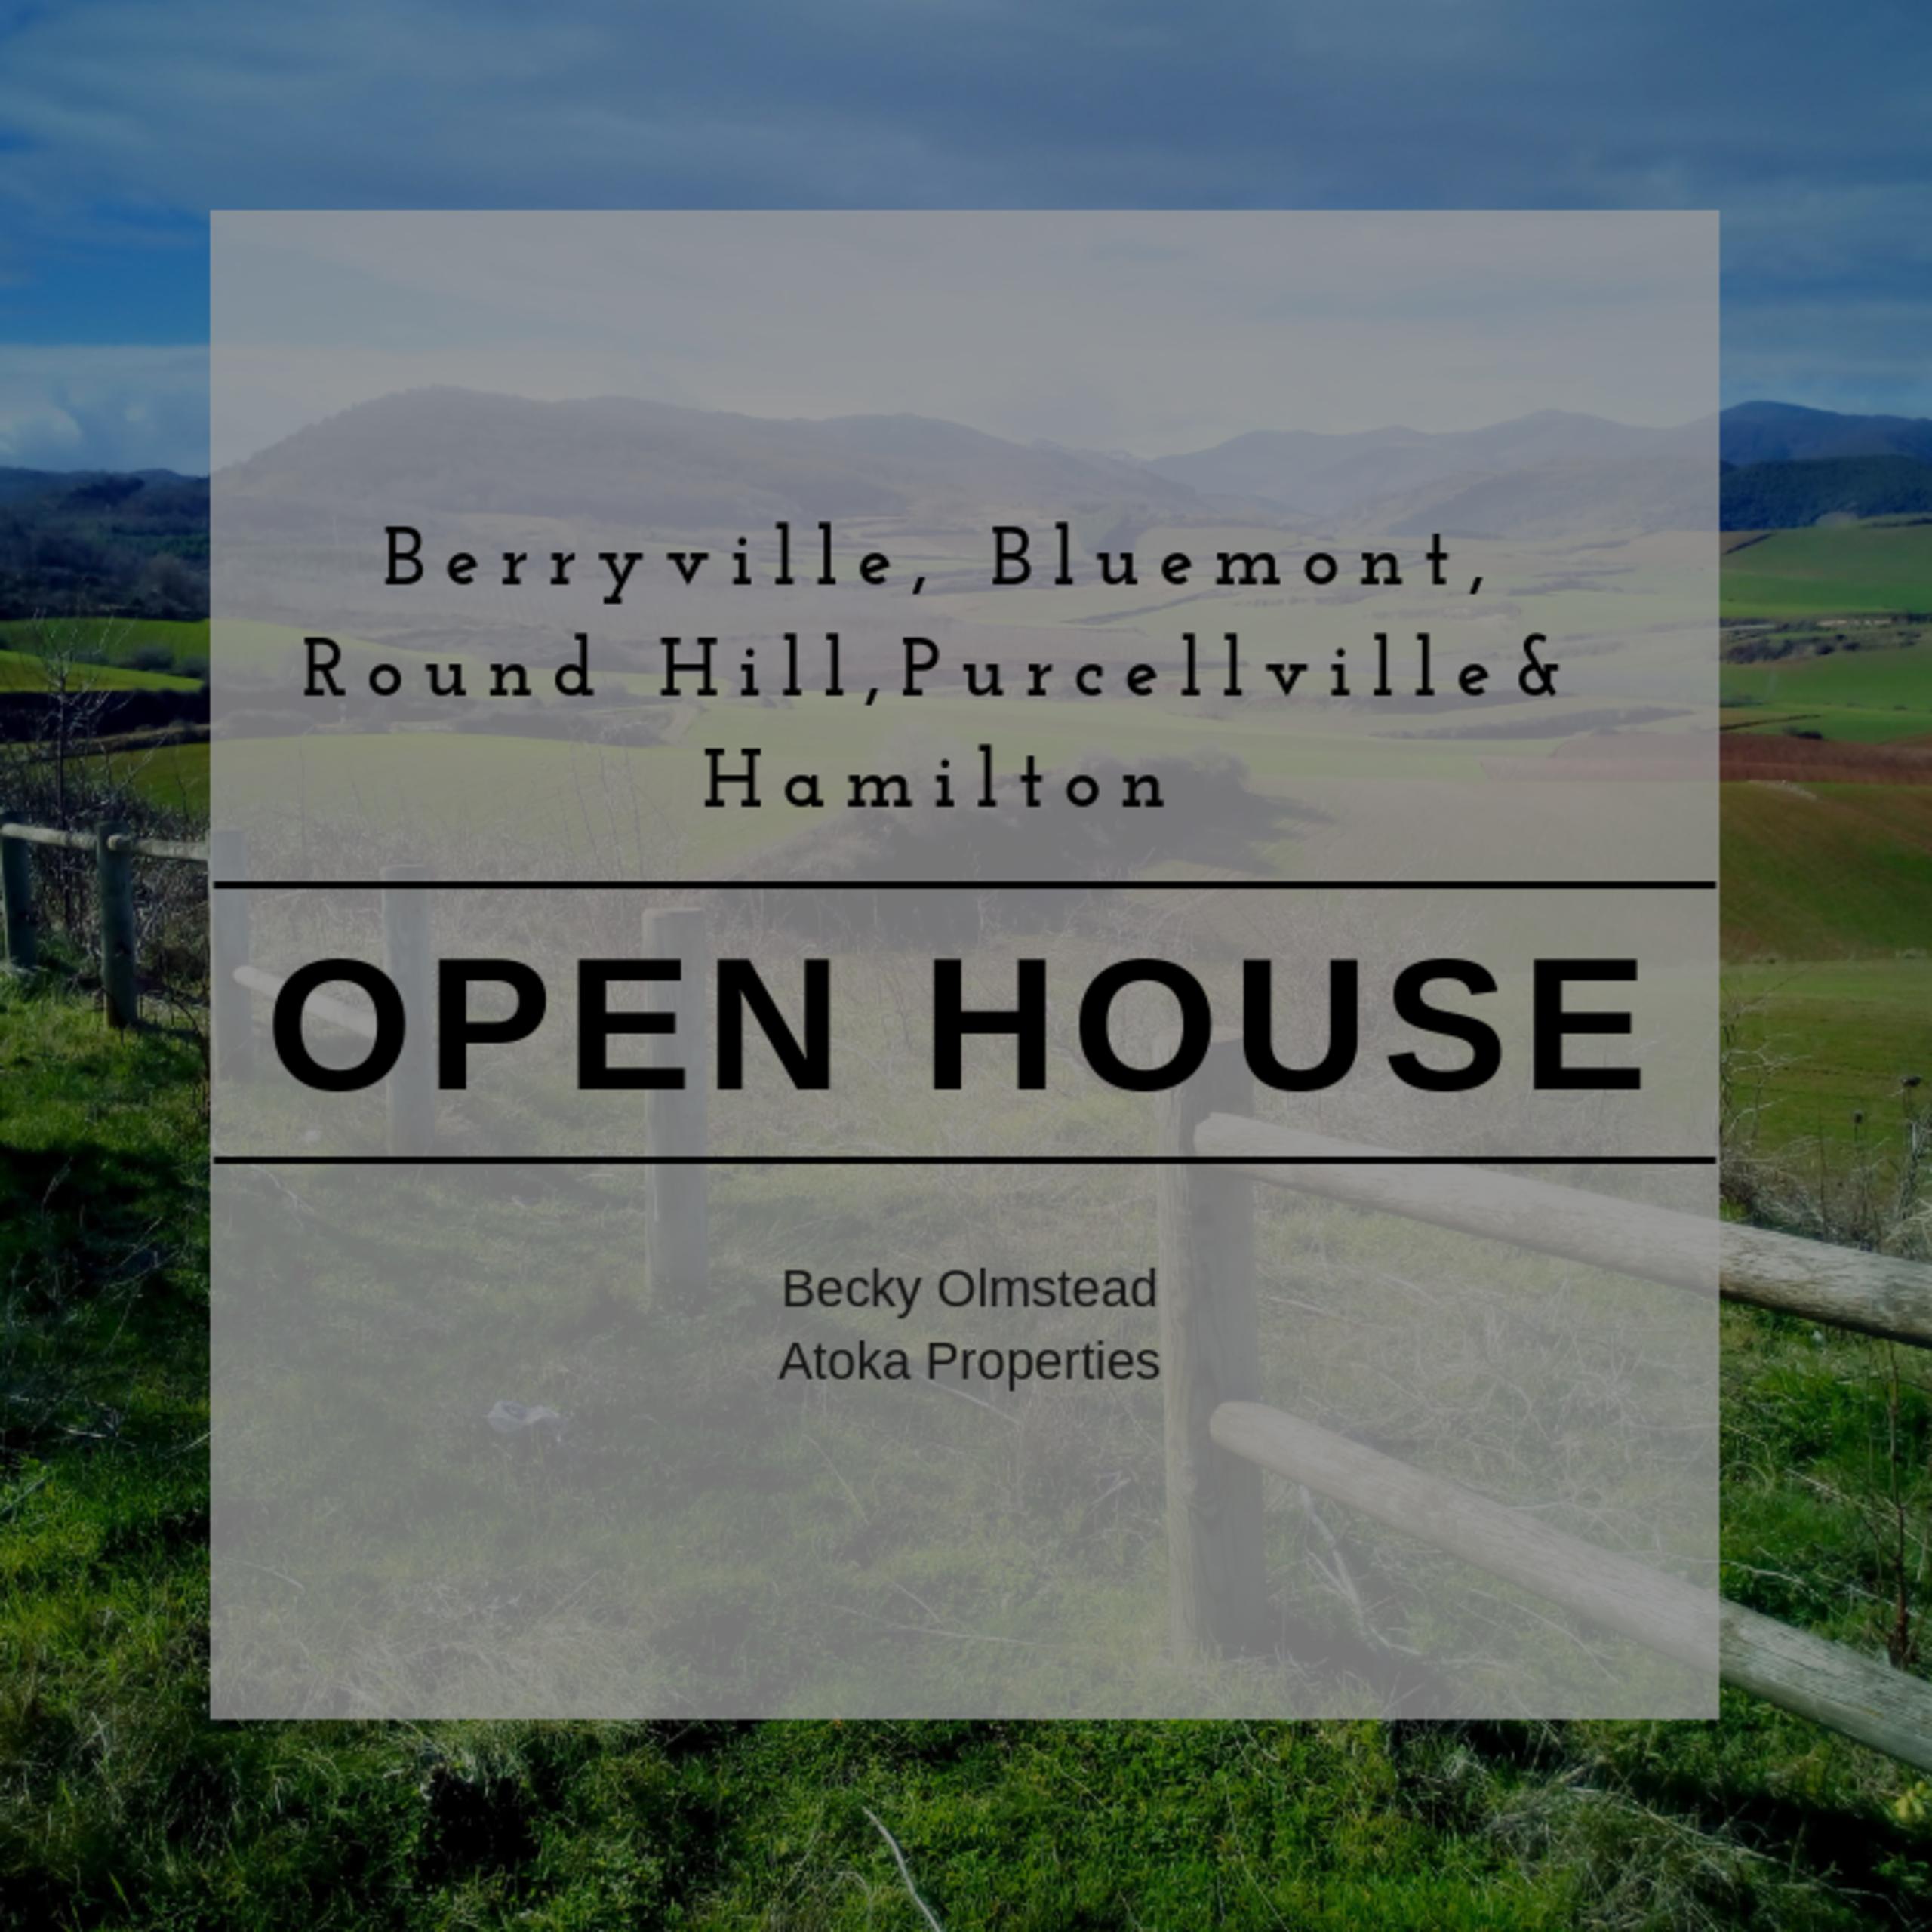 OPEN HOUSE LIST 9/8/18 – 9/9/18